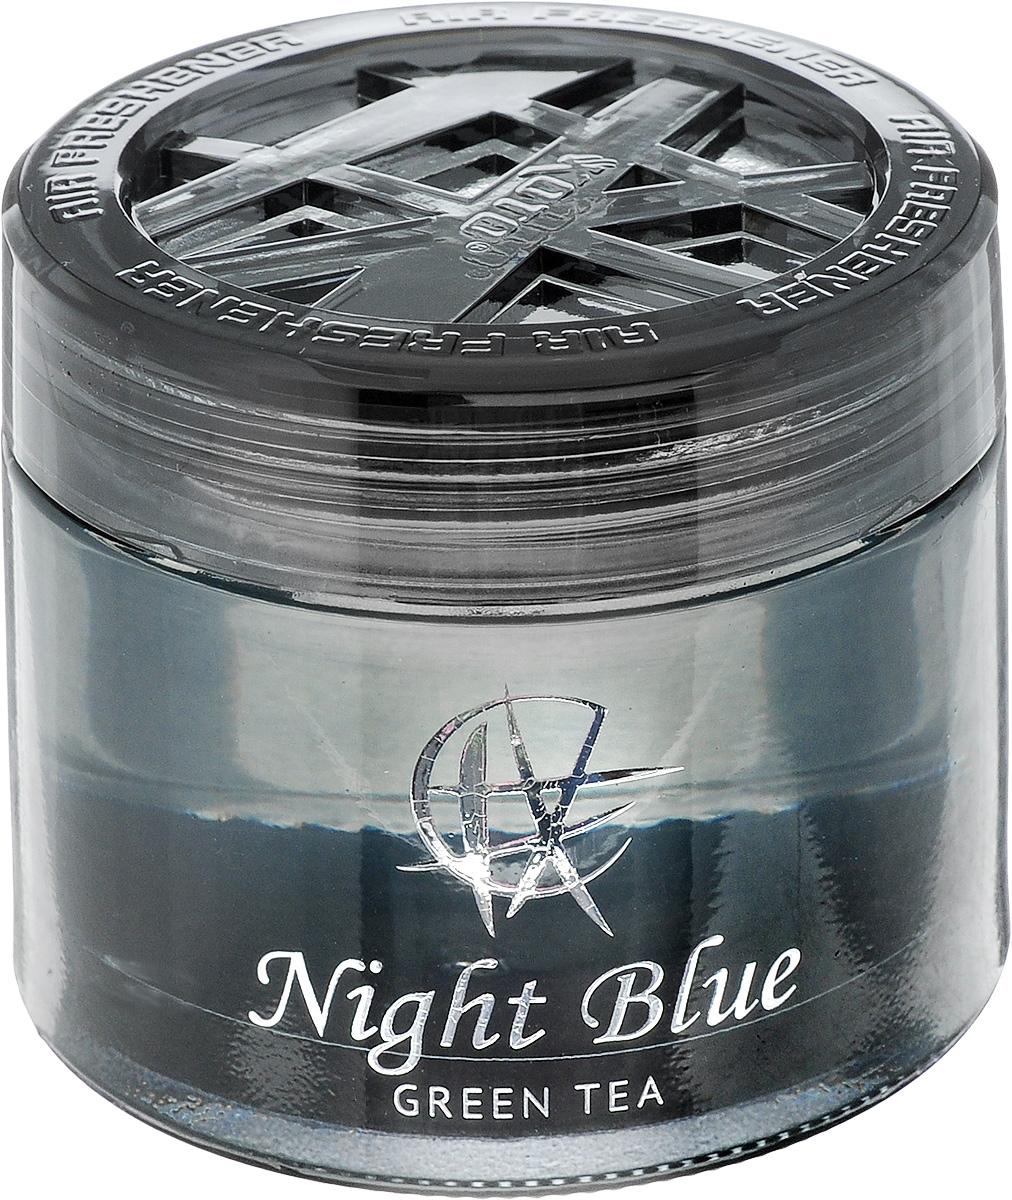 Ароматизатор автомобильный Koto Night Blue. Green tea, гелевый, 65 мл